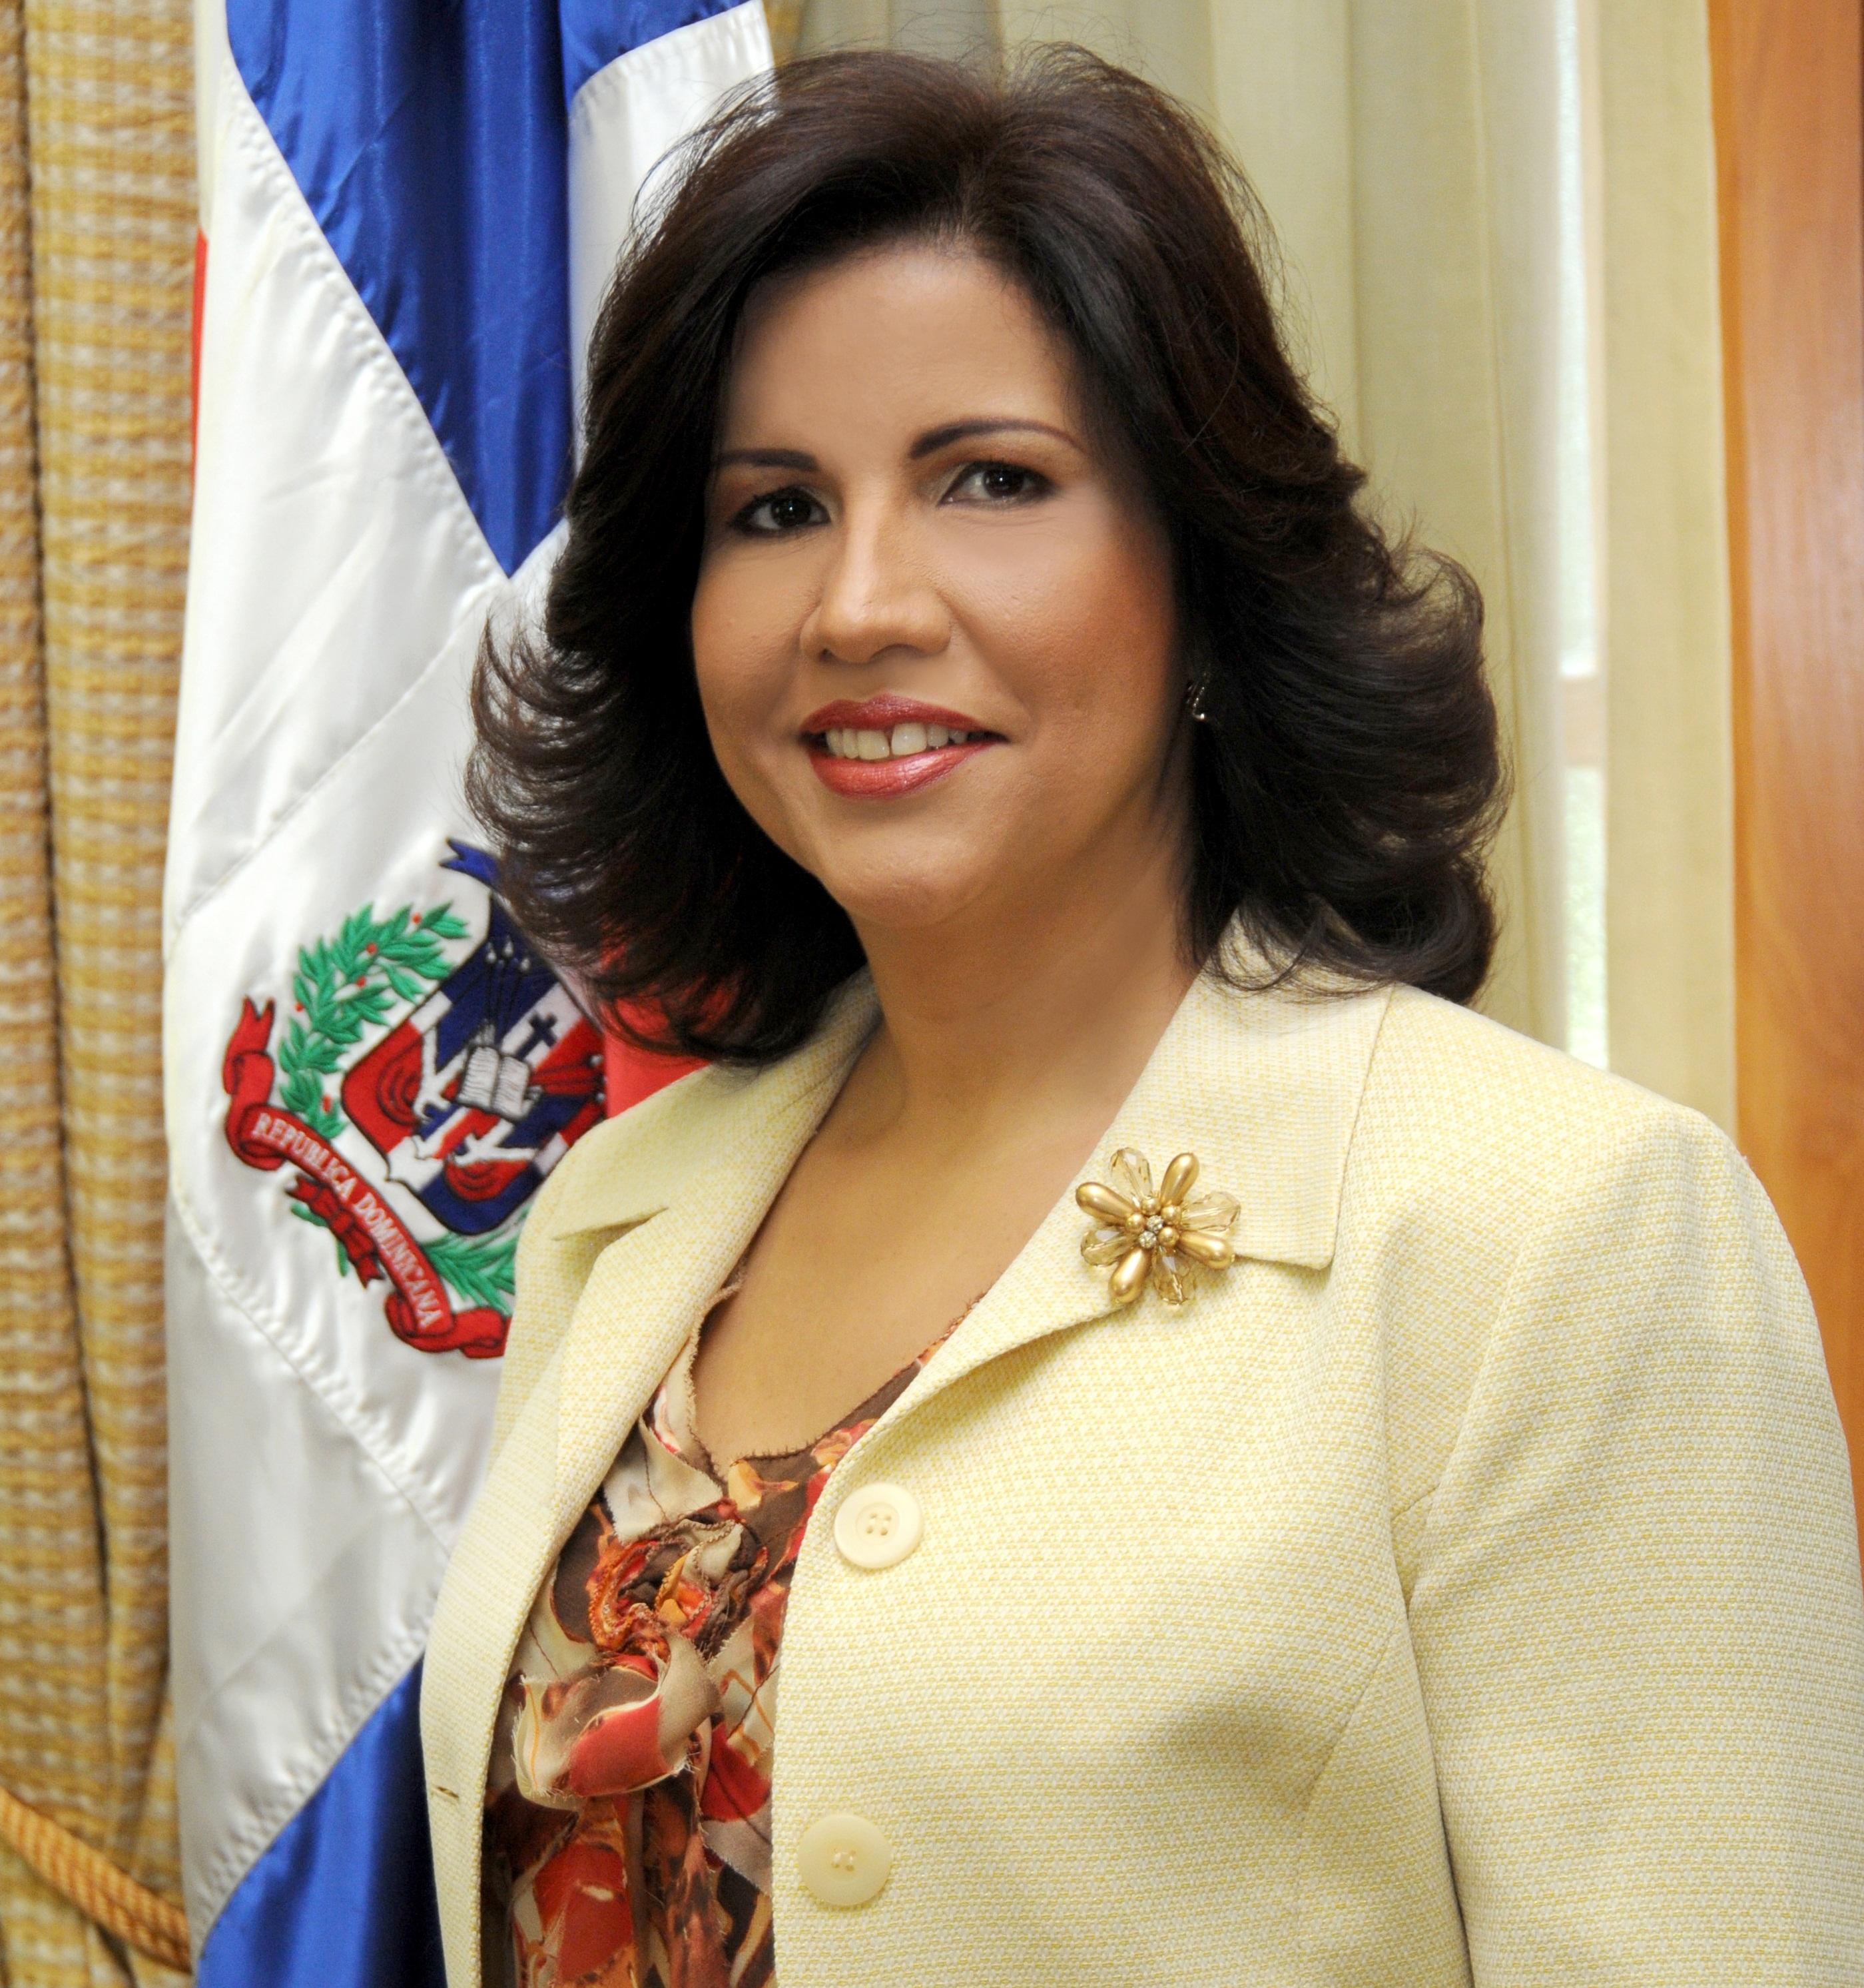 Margarita-Cedeño-de-Fernández.